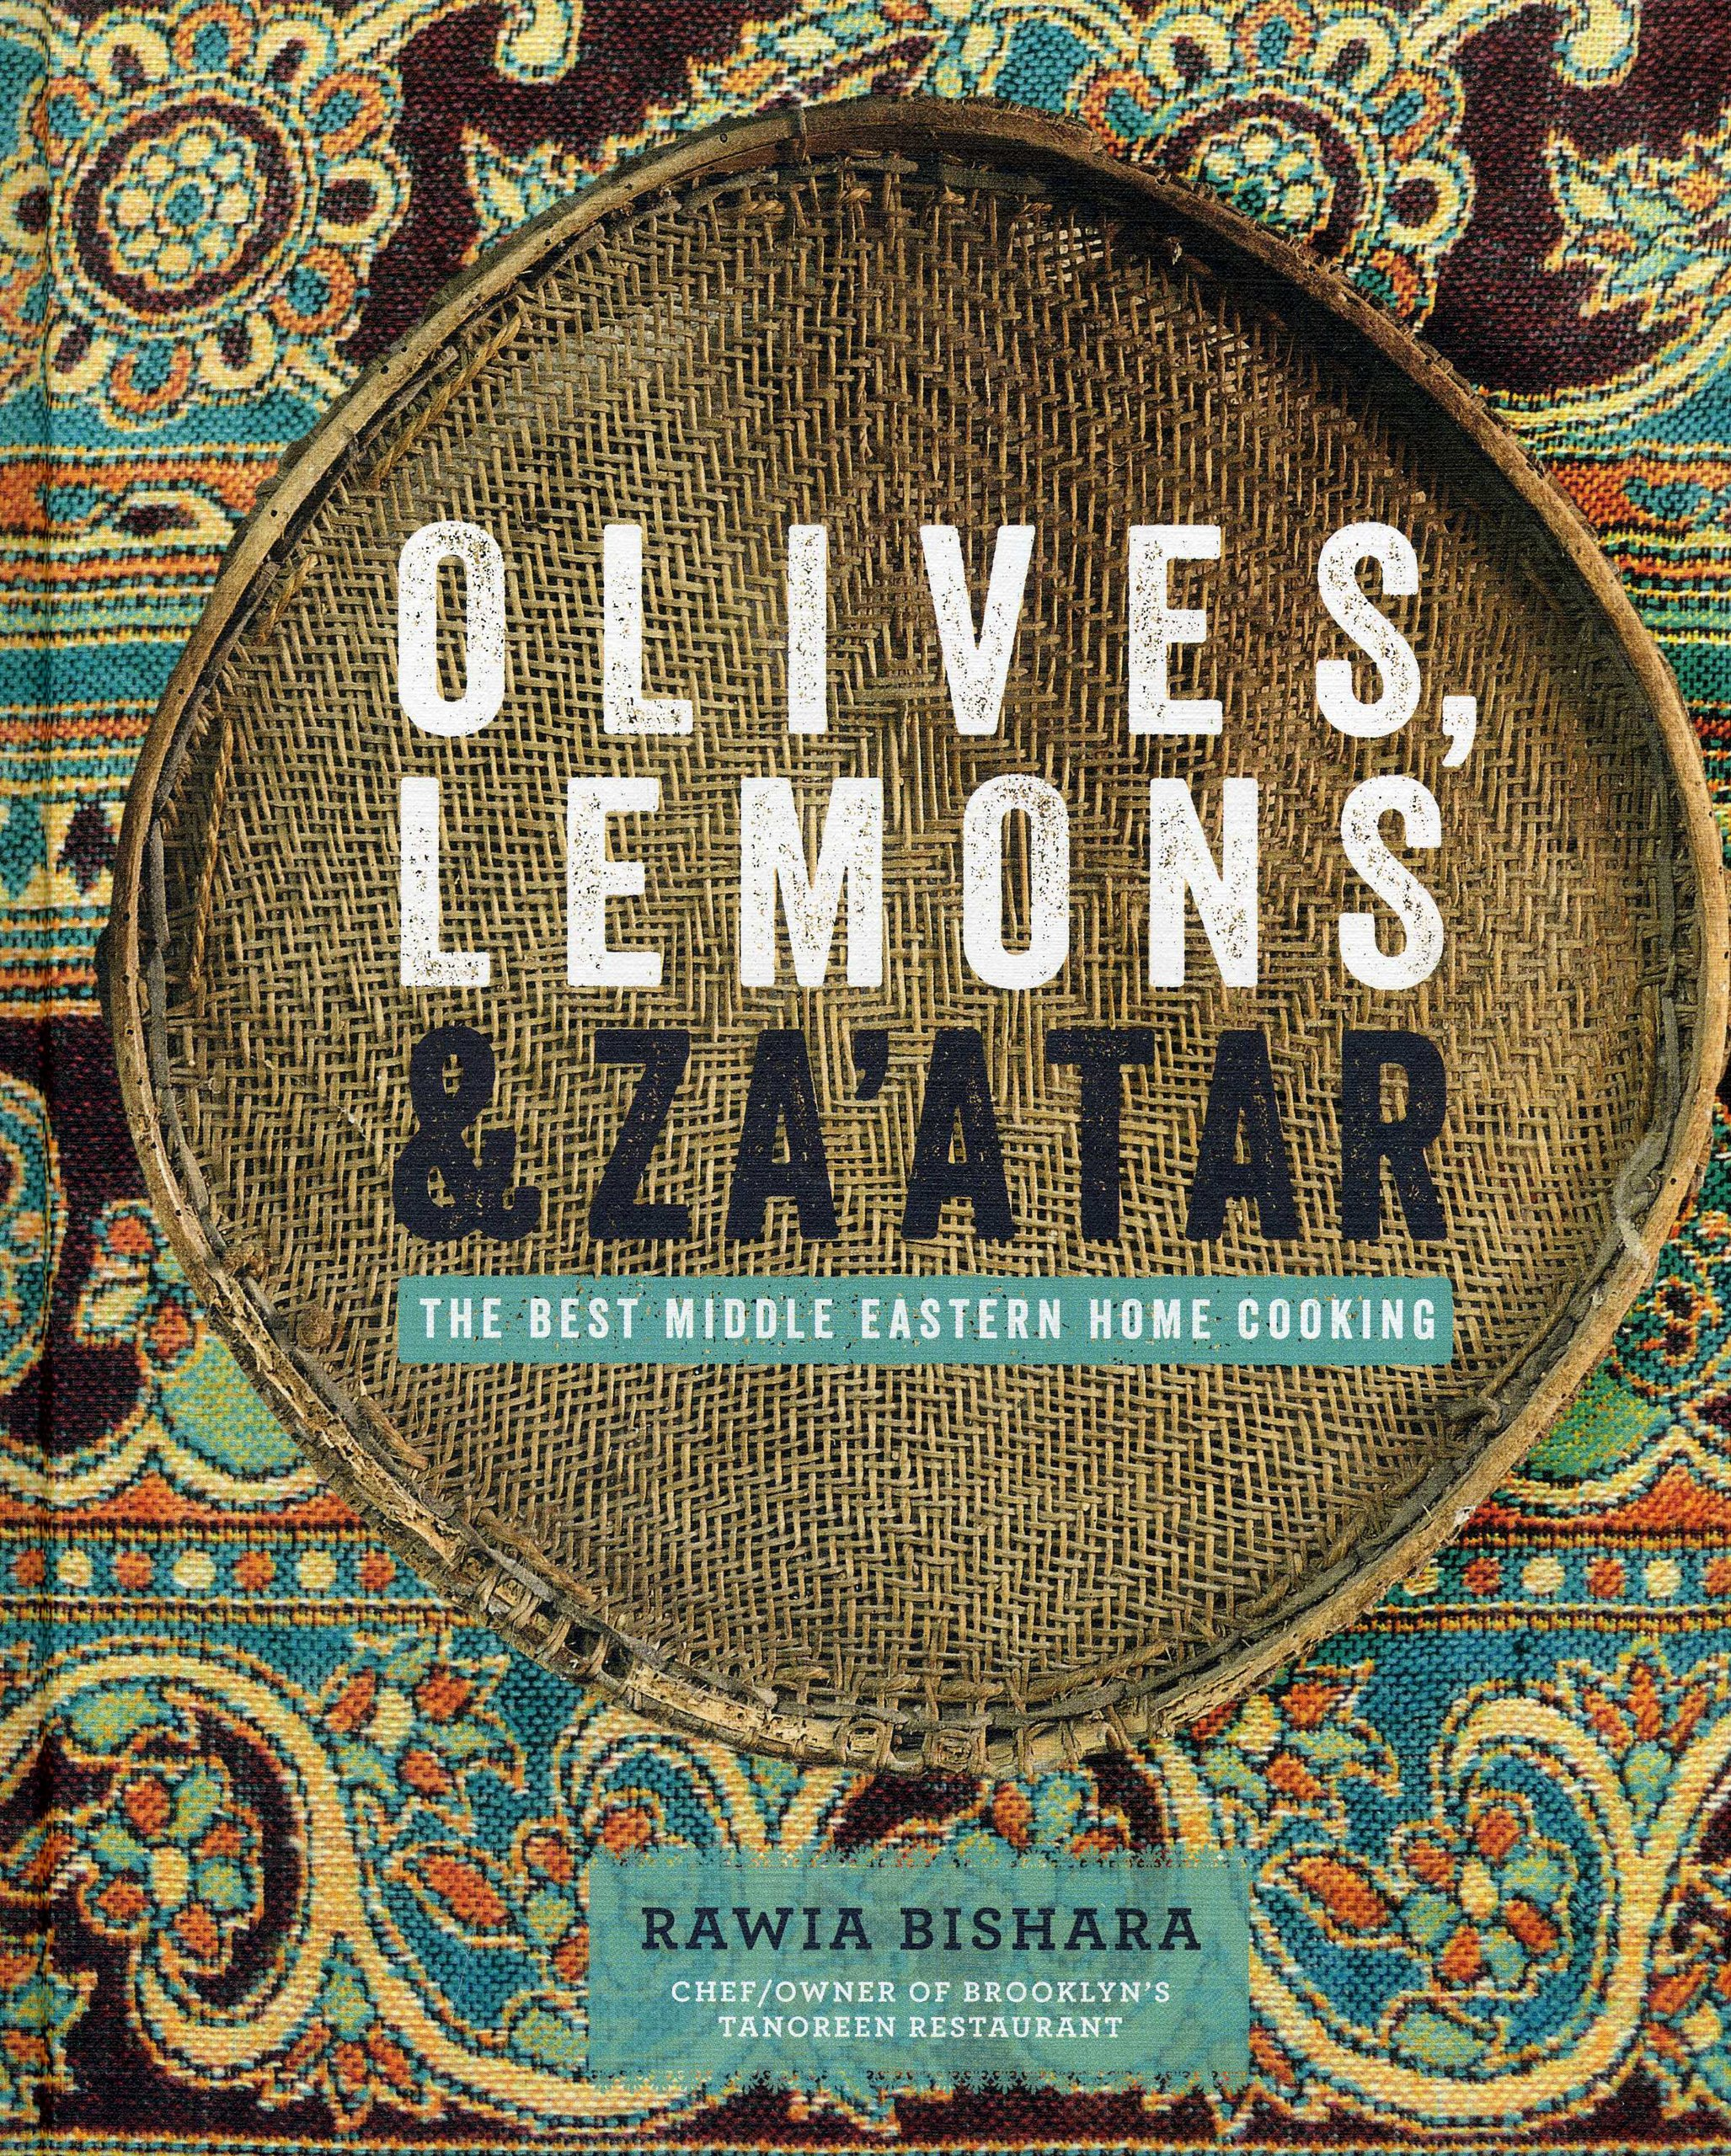 Olives lemons zaatar the best middle eastern home cooking olives lemons zaatar the best middle eastern home cooking rawia bishara 9781906868840 amazon books forumfinder Gallery